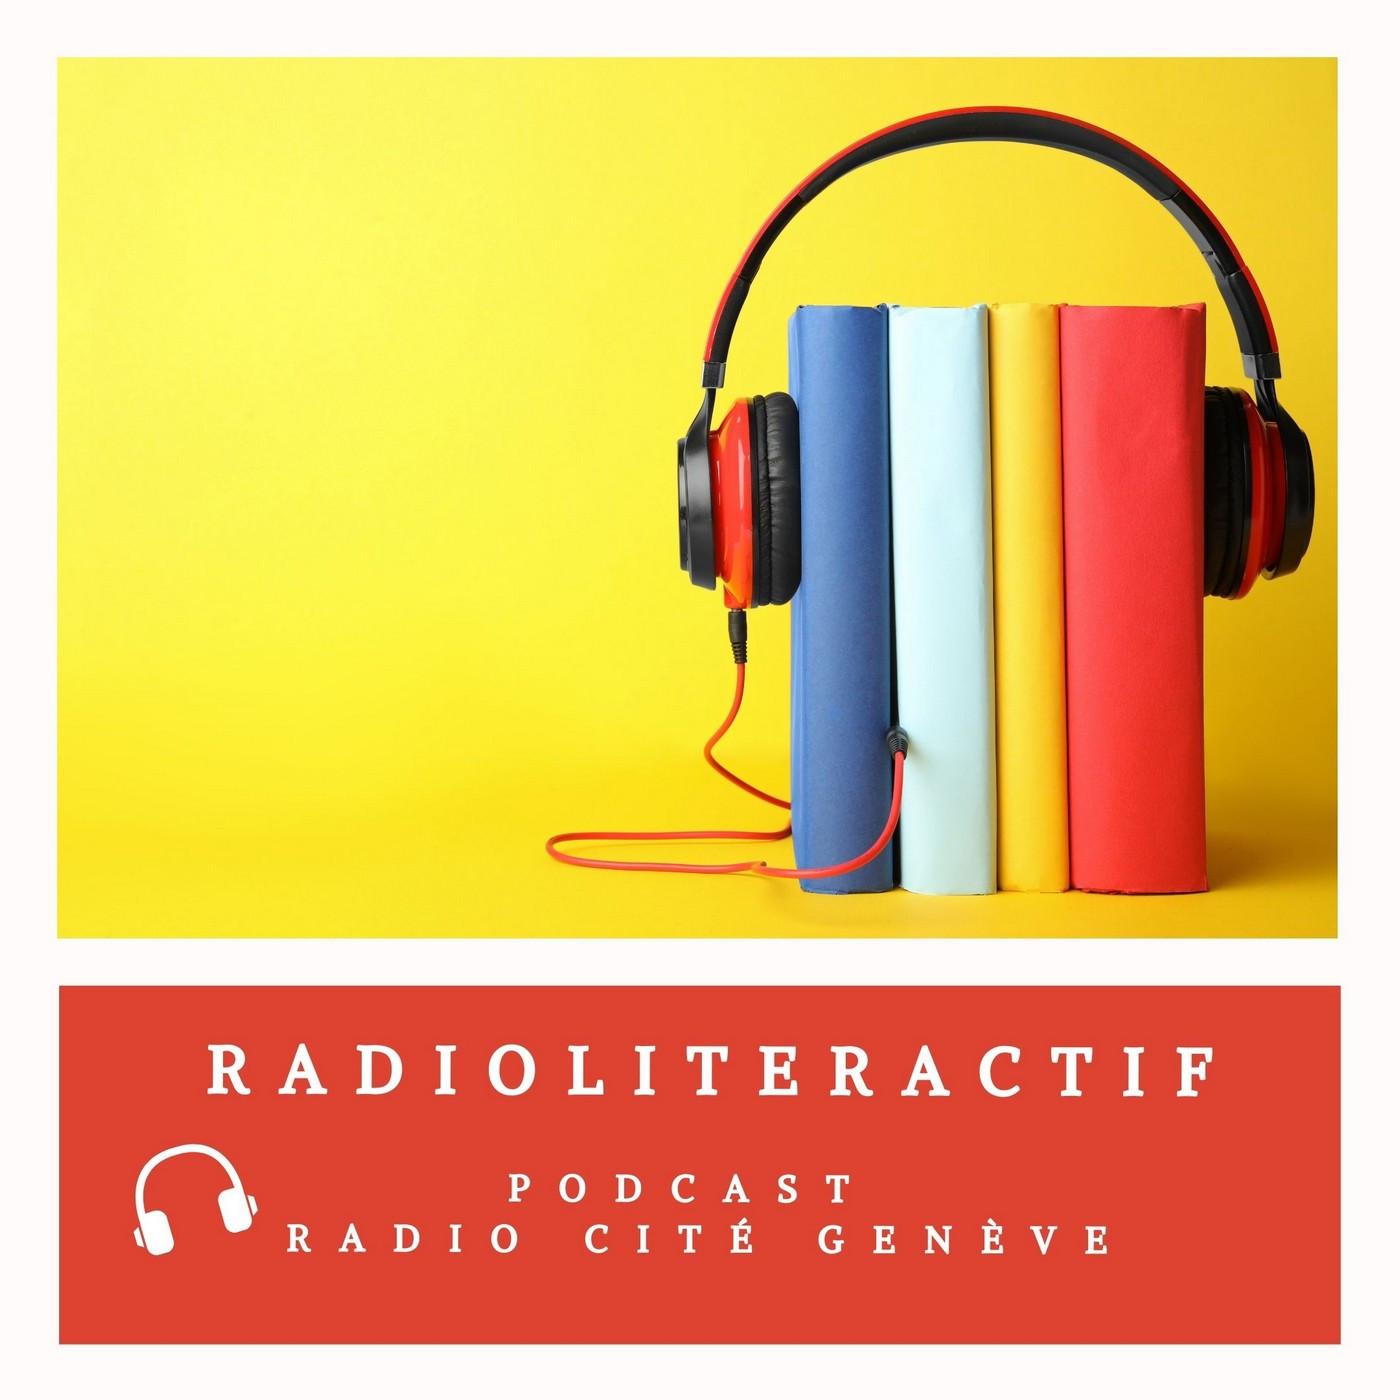 Radioliteractif du 23/11/20 - Nicolas Feuz , L'engrenage du mal